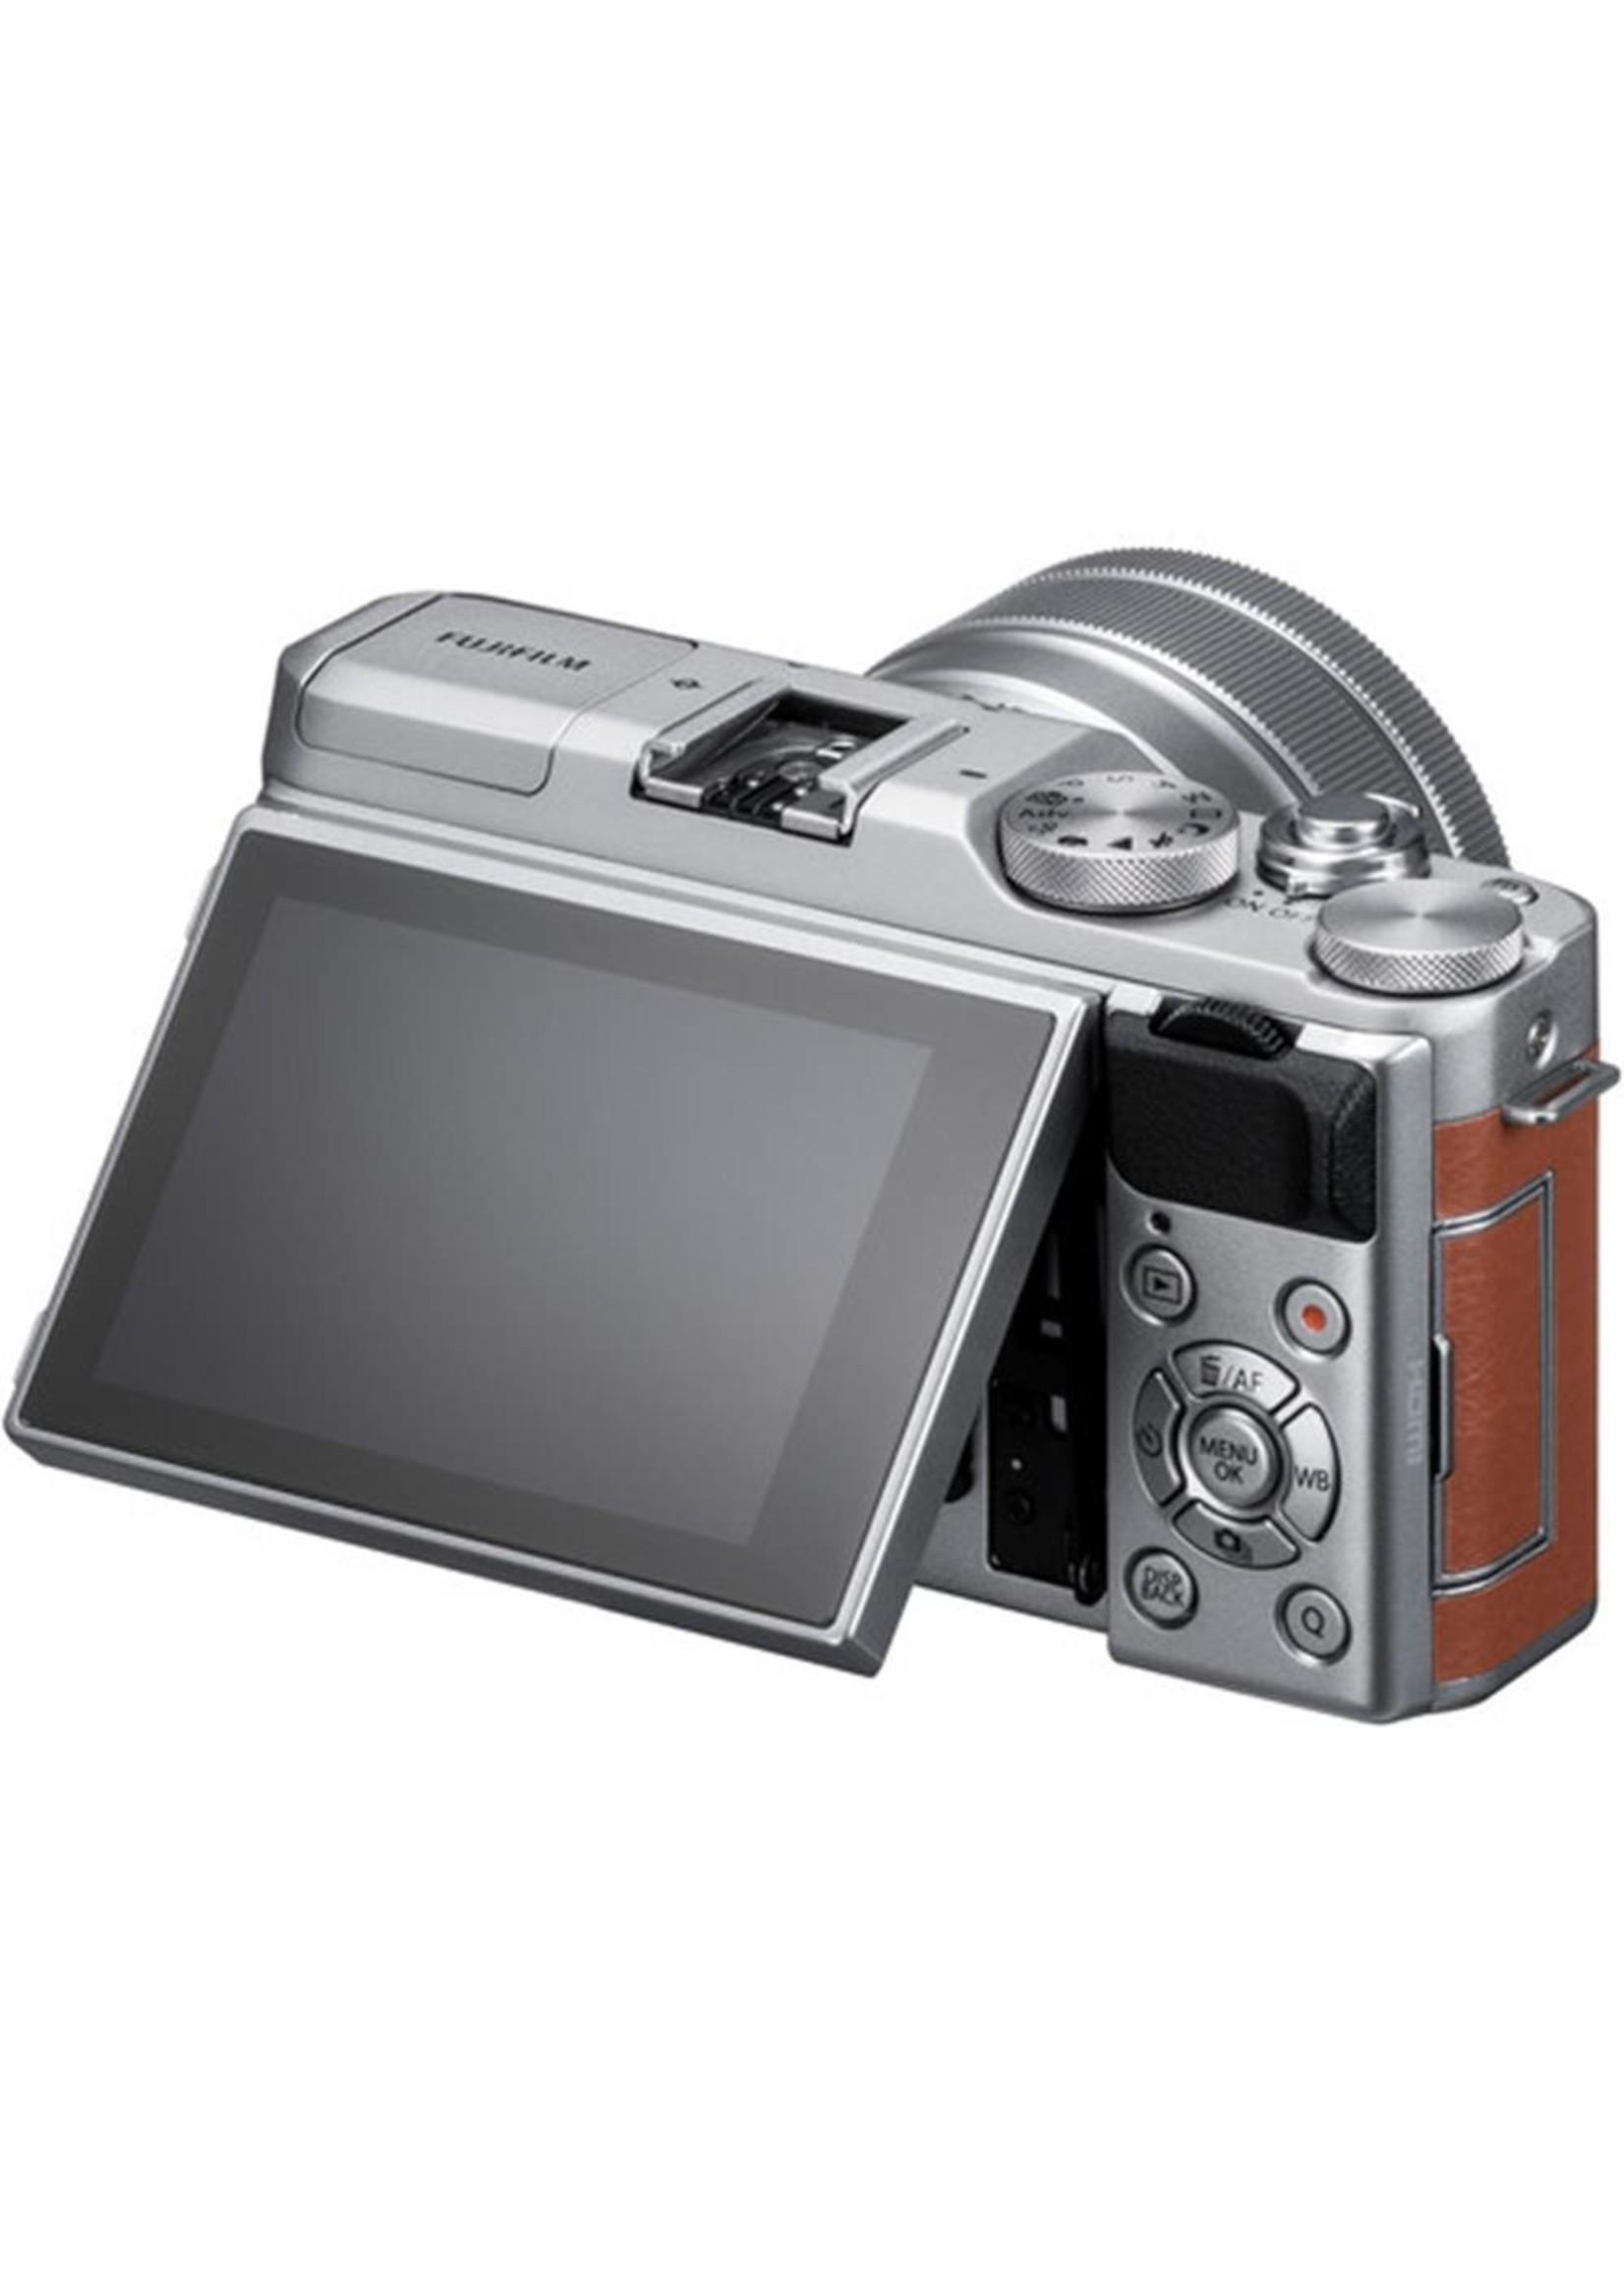 Fuji FUJIFILM X-A5 Mirrorless Digital Camera with 15-45mm Lens (Brown)